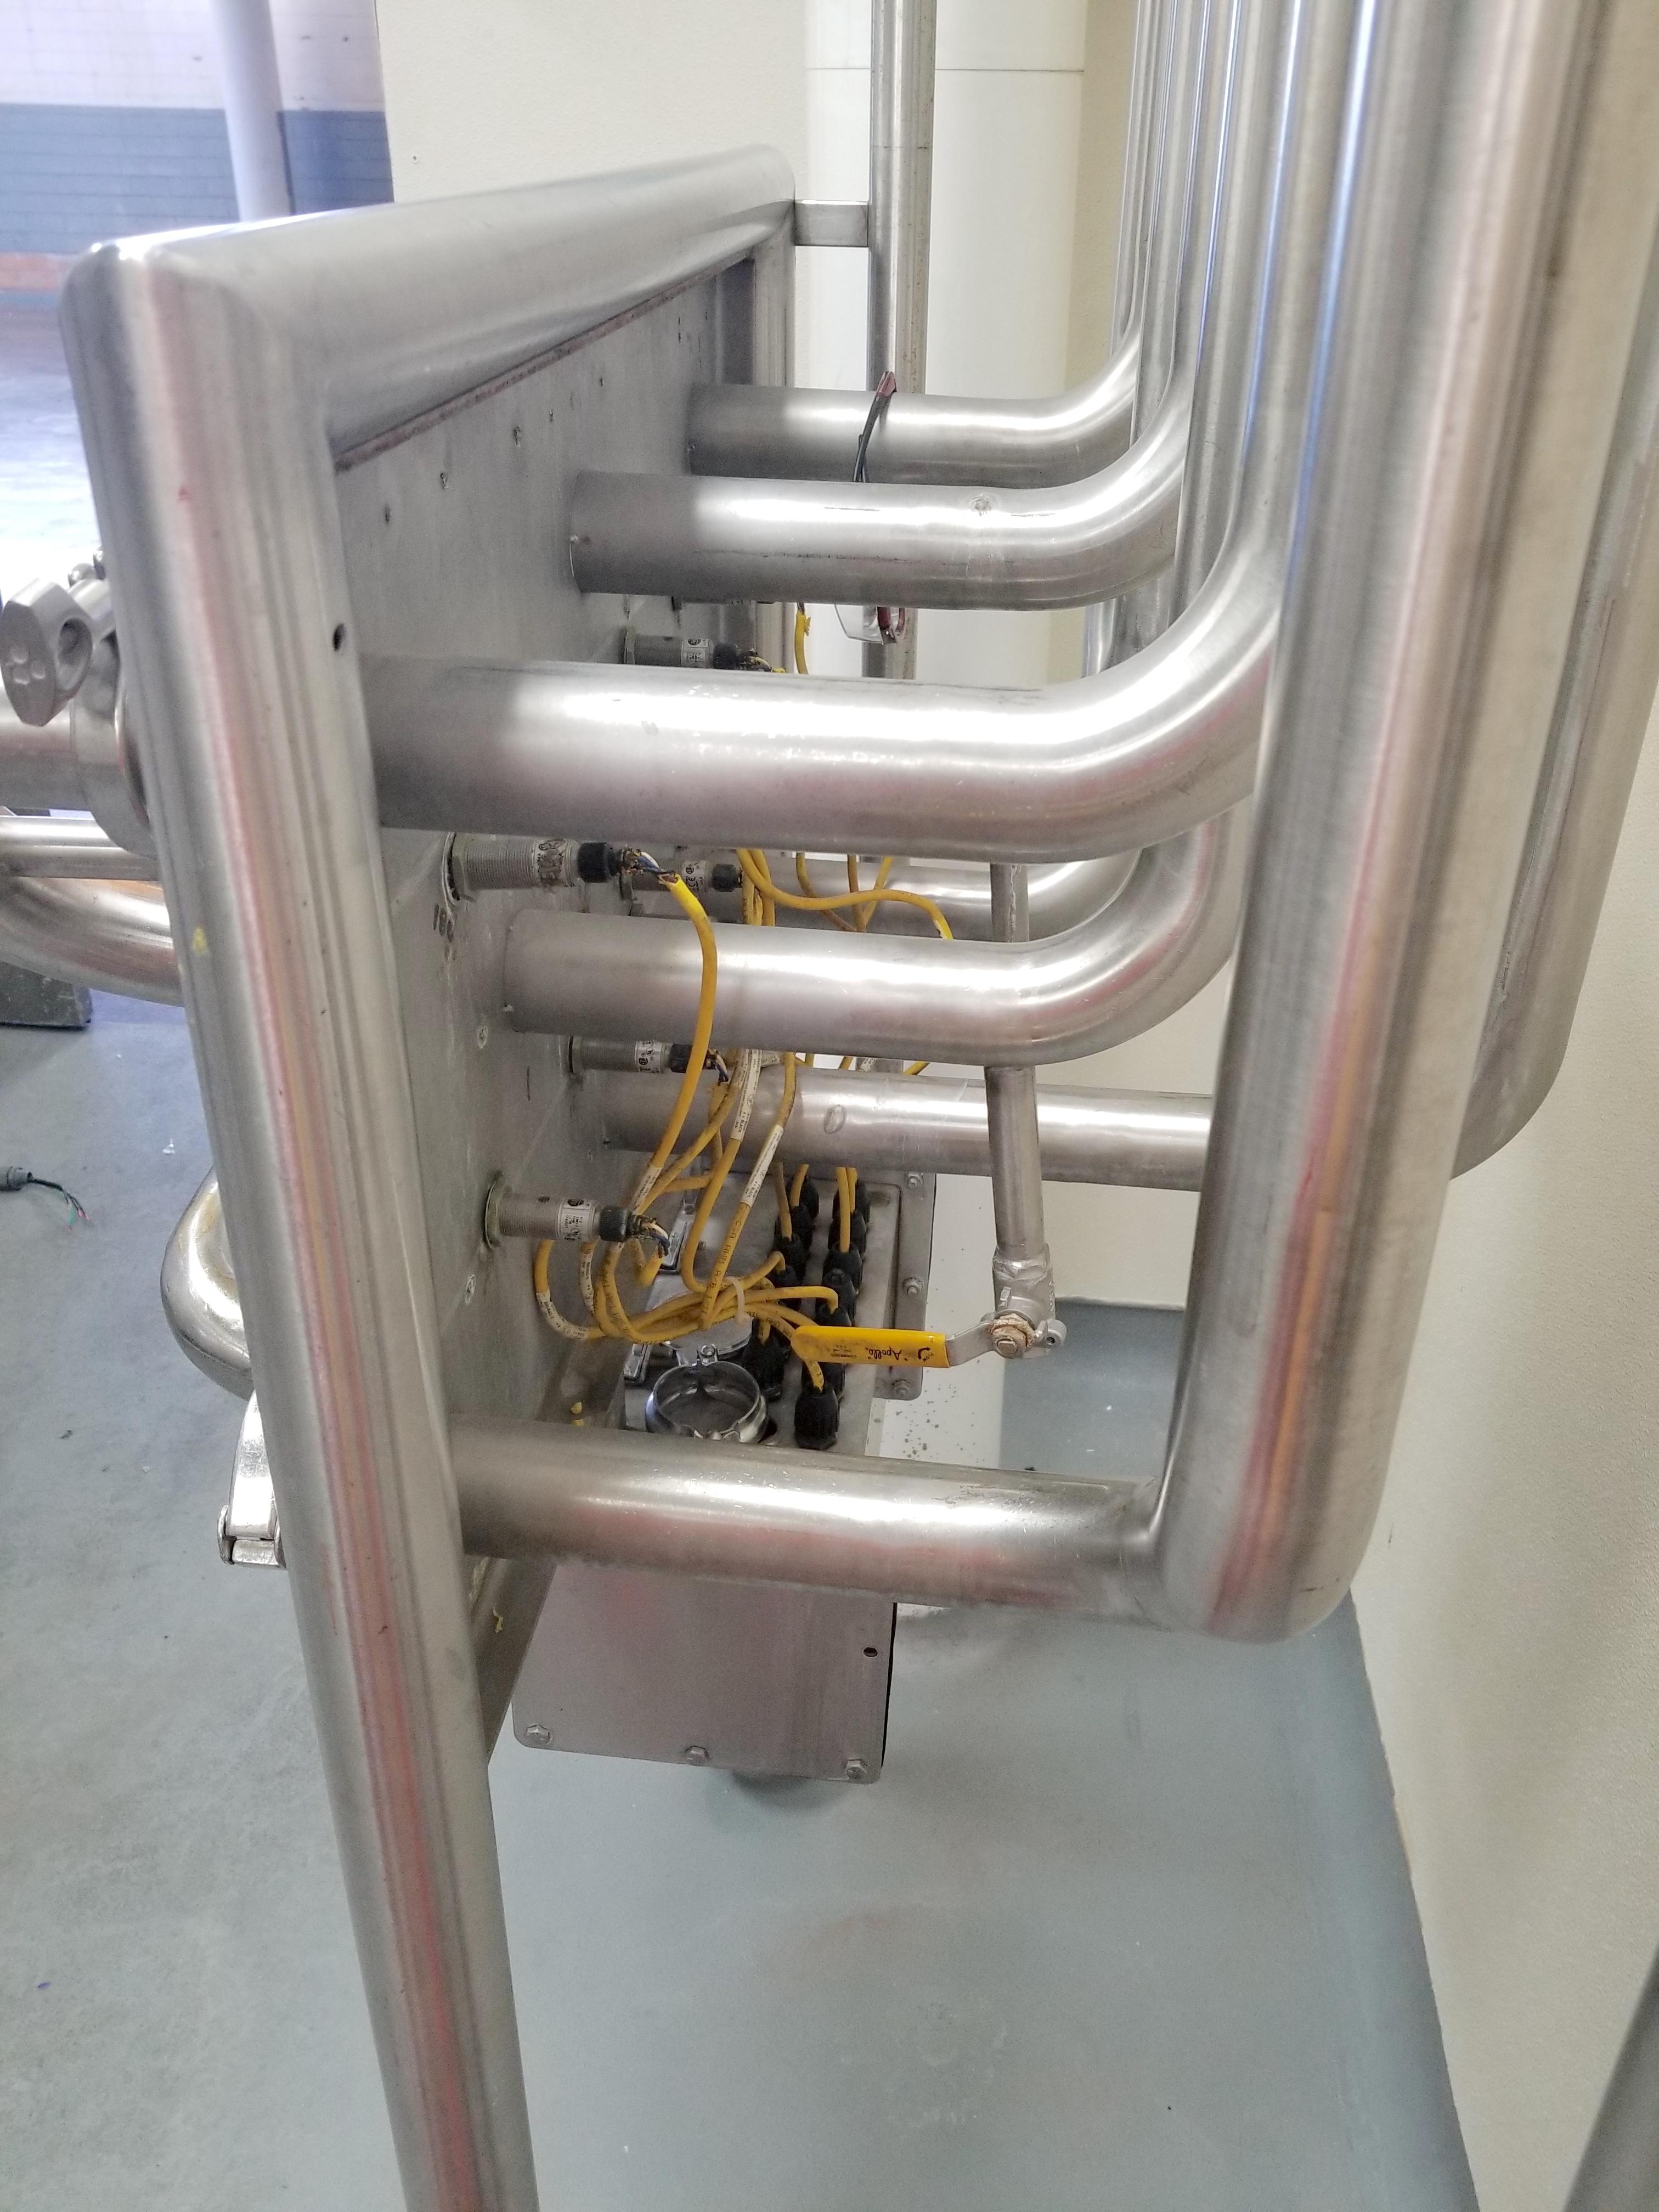 8 Port Divert Panel - Image 3 of 3